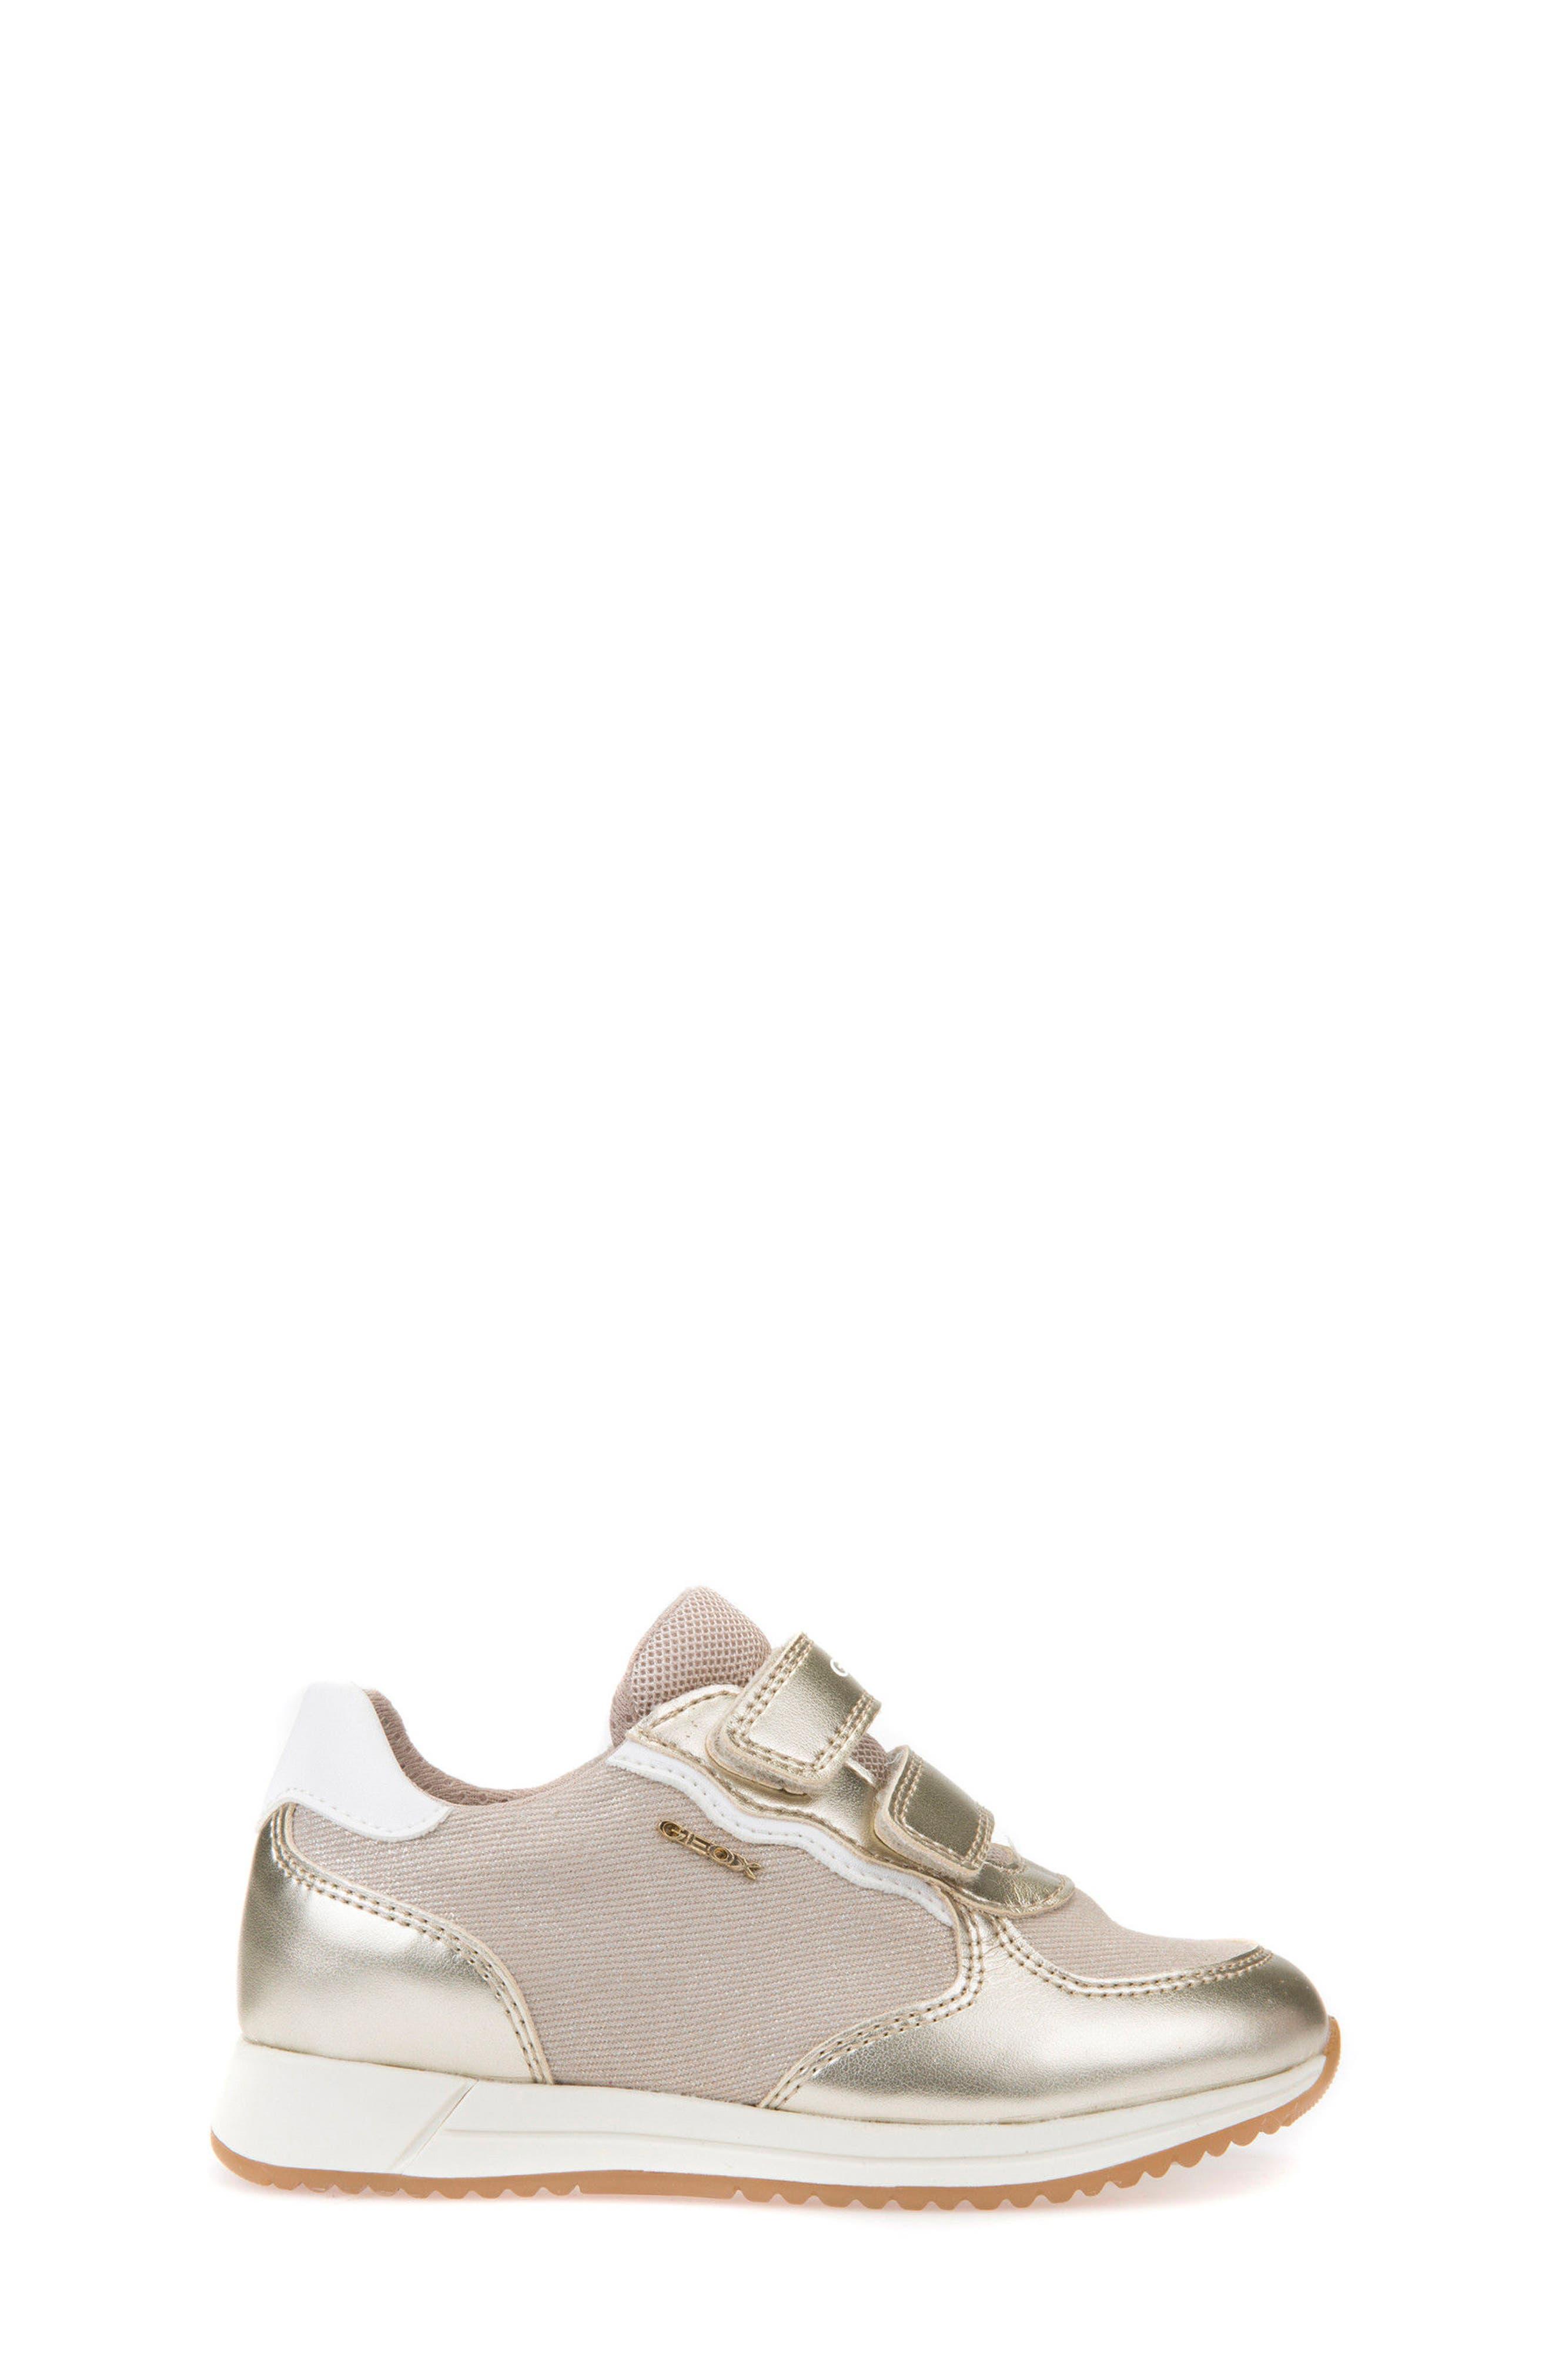 Jensea Metallic Accent Sneaker,                             Alternate thumbnail 3, color,                             BEIGE/ LIGHT GOLD